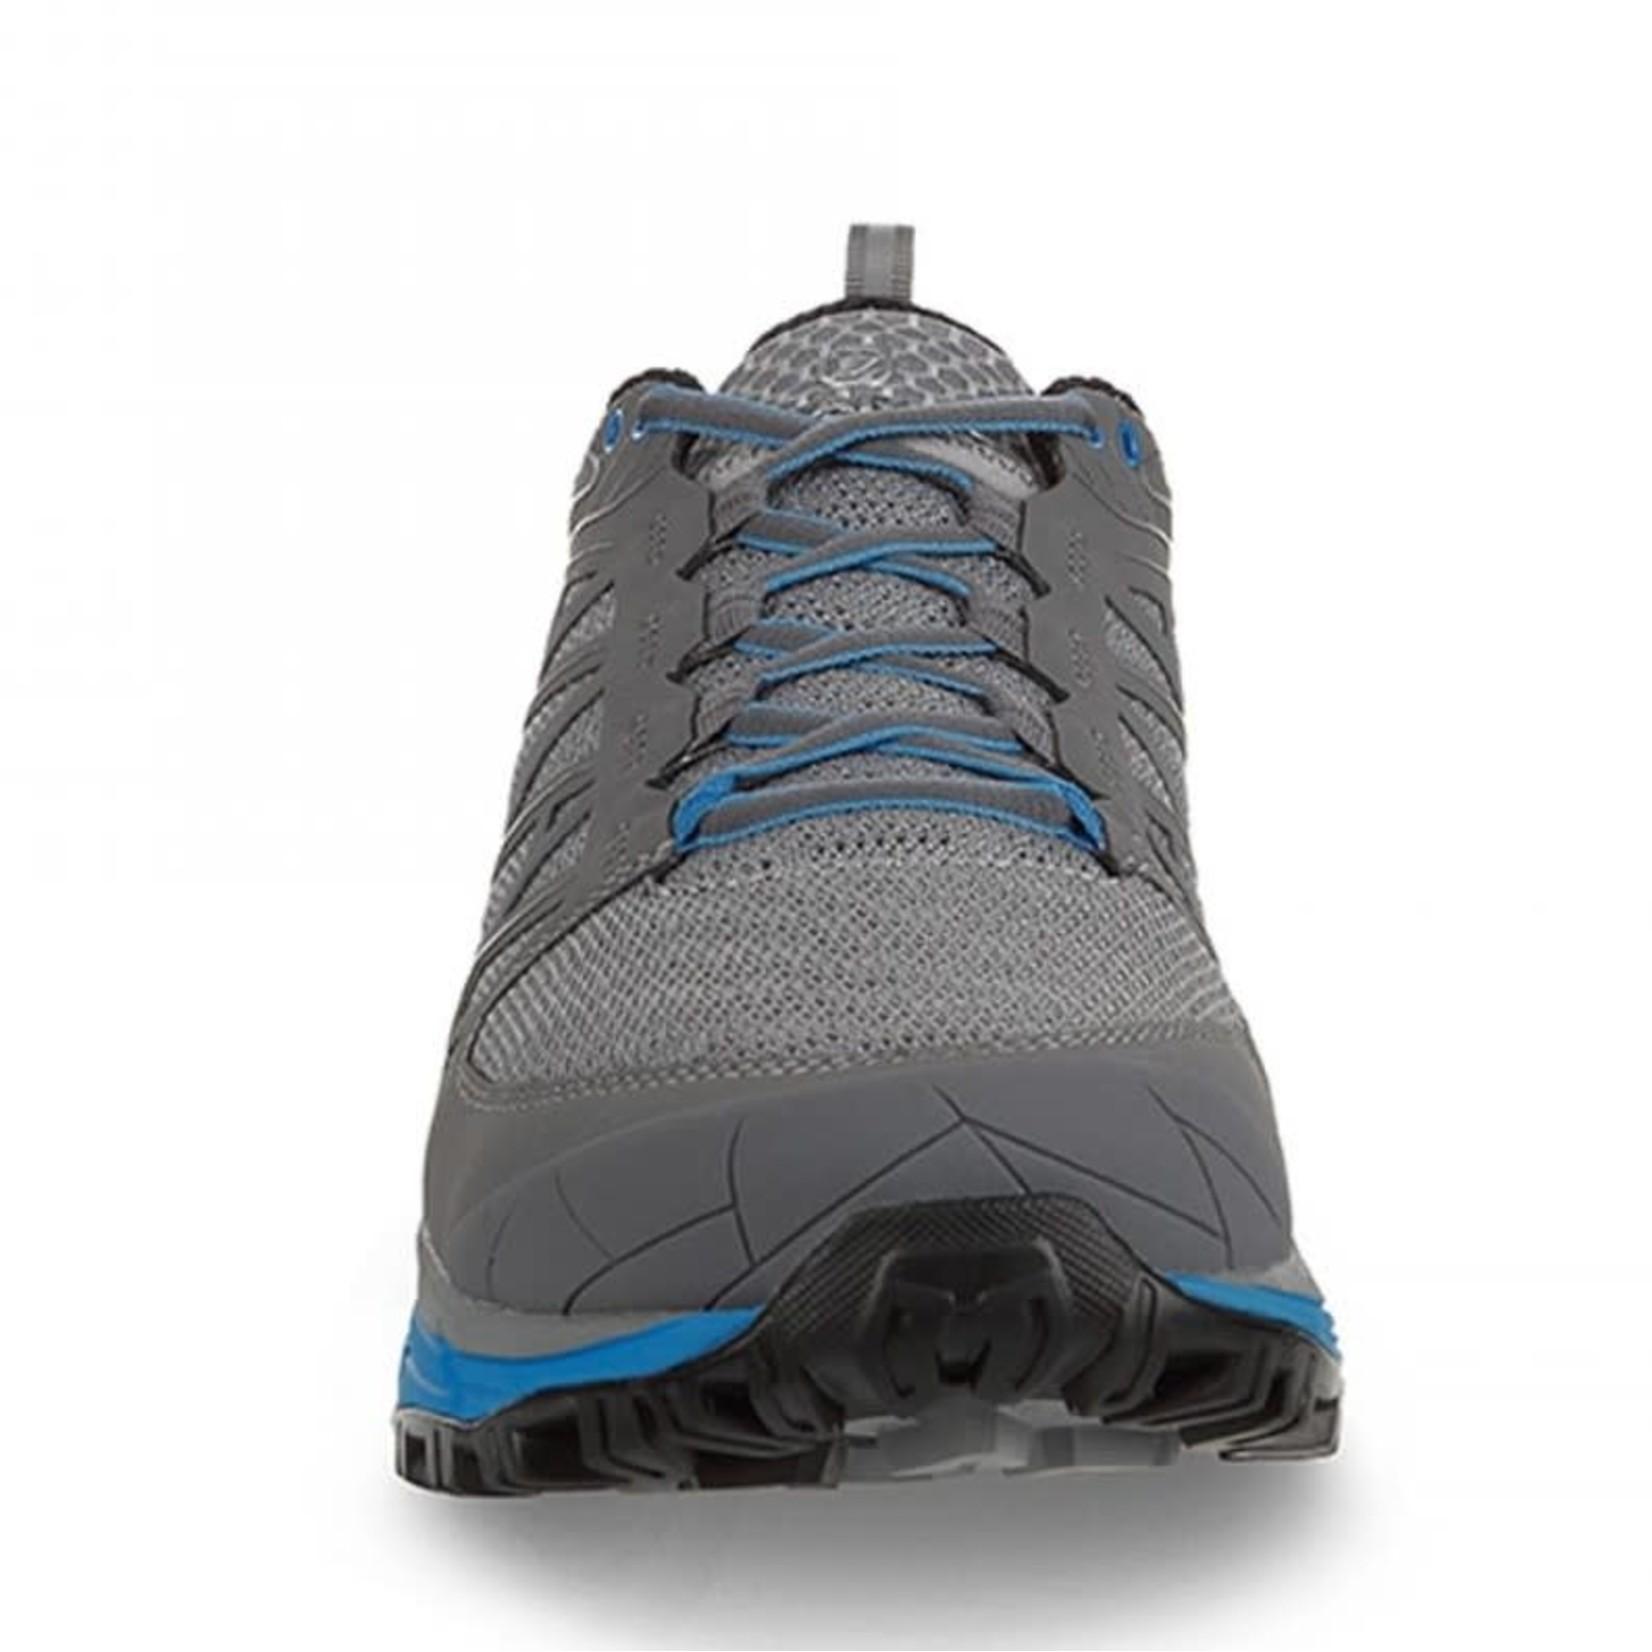 Scarpa Chaussure Scarpa Proton XT - Homme